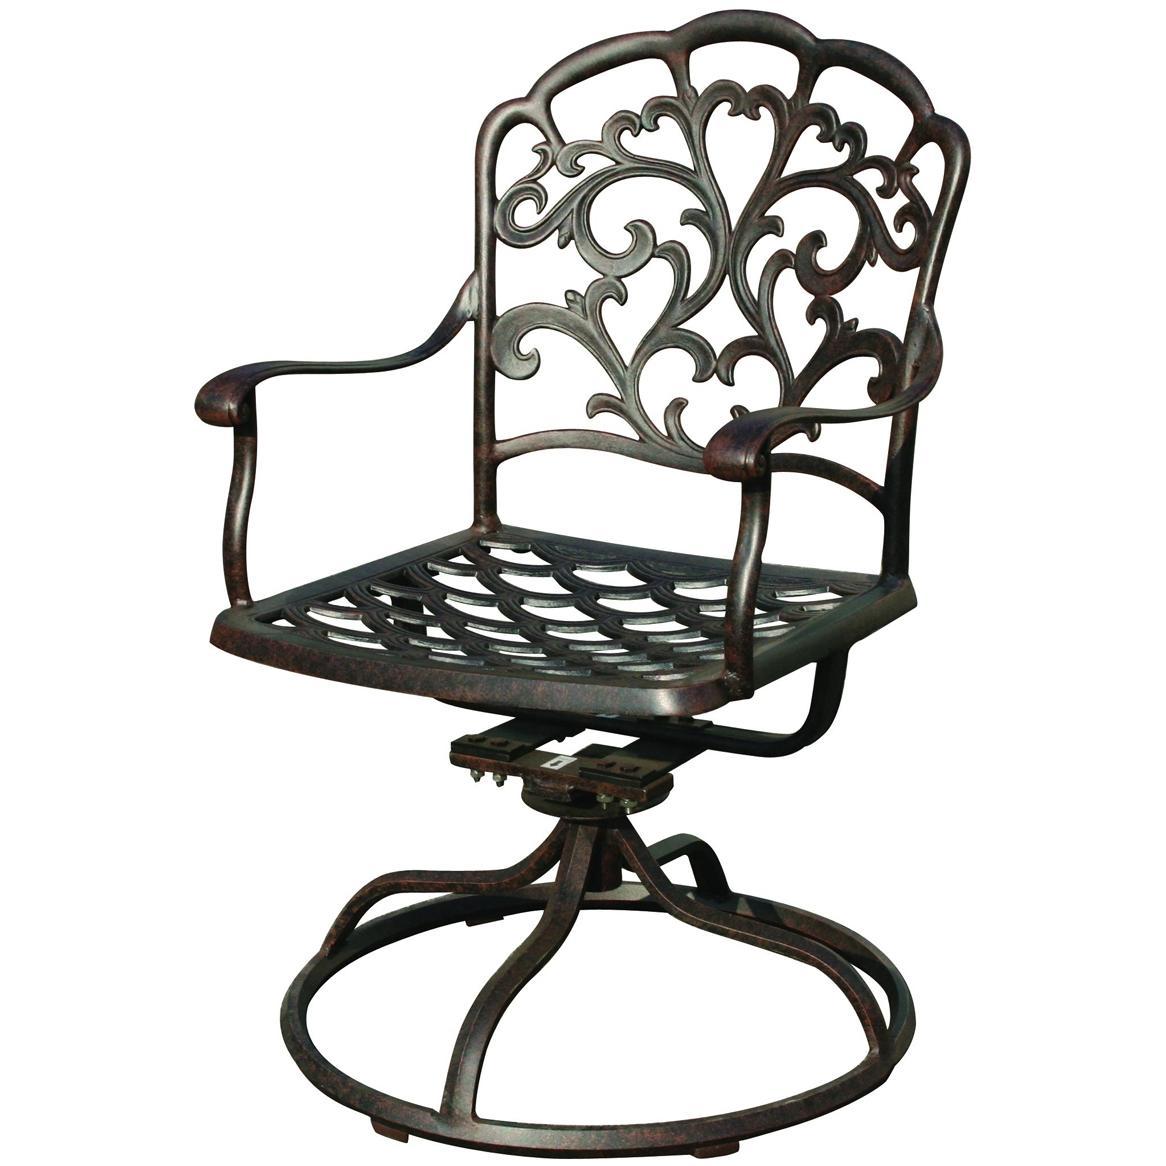 Darlee Catalina Cast Aluminum Outdoor Patio Swivel Rocker Chair With Cushion - Antique Bronze